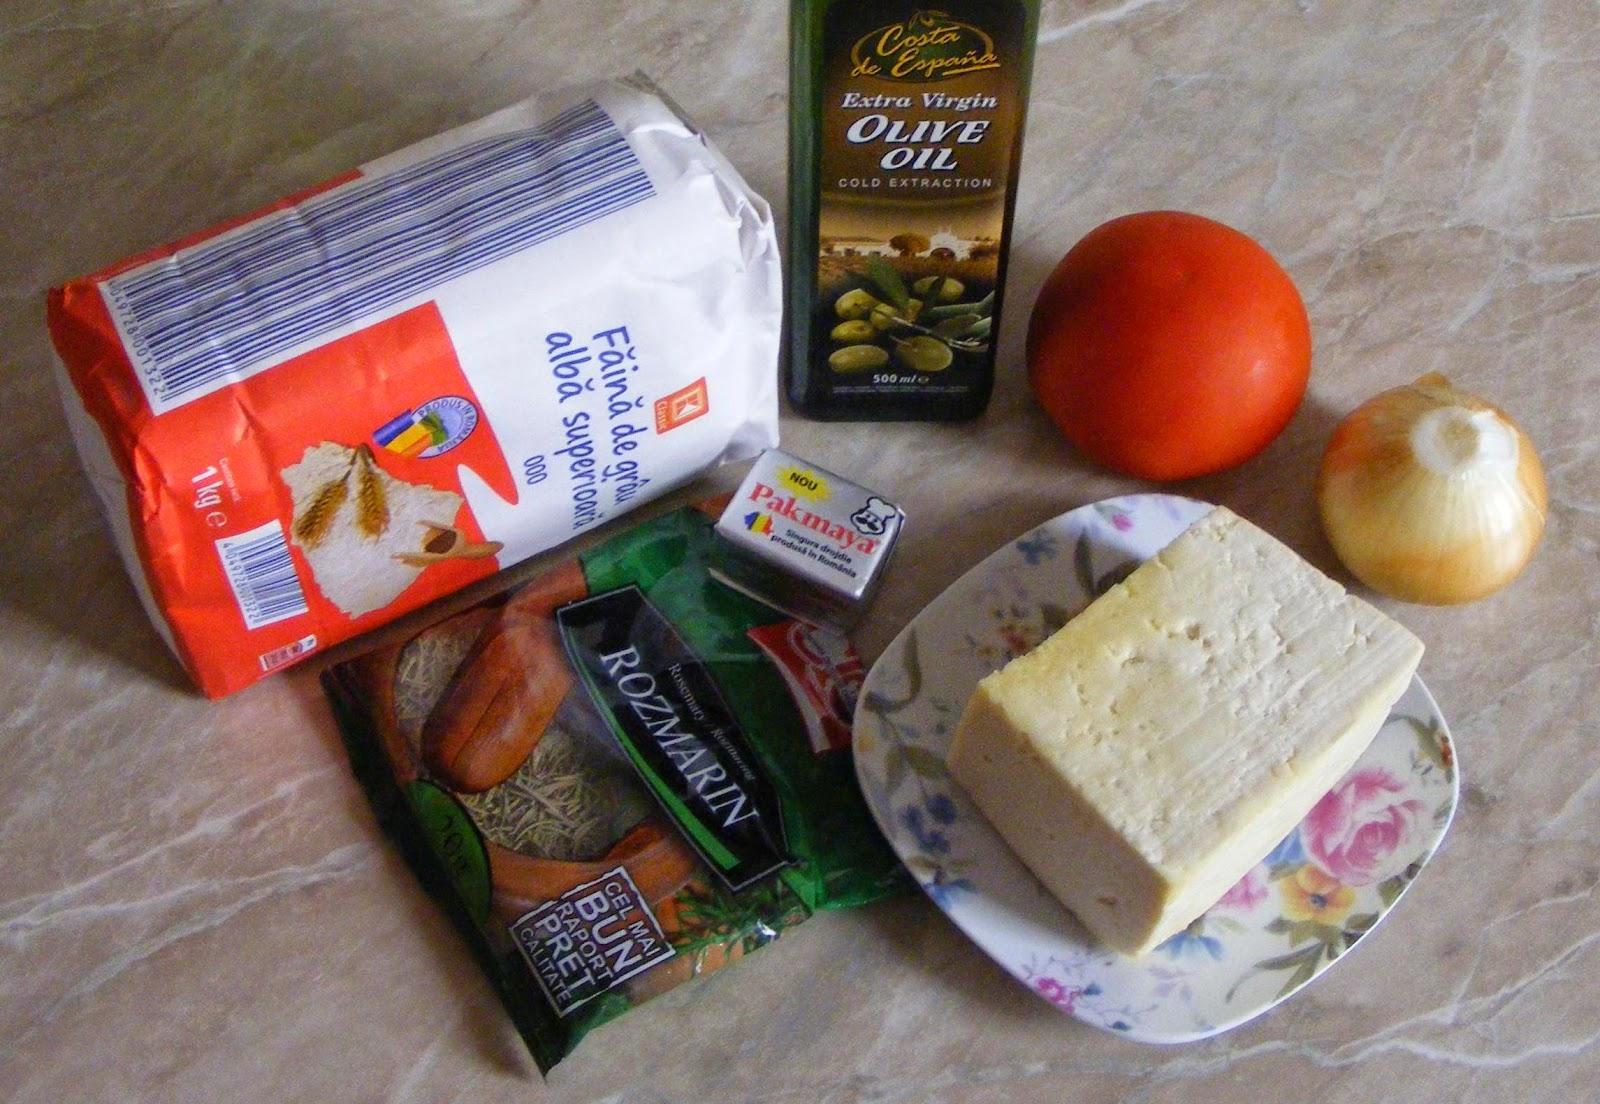 focaccia ingrediente, ingrediente pentru focaccia cu branza si rosii, retete focaccia, reteta focaccia, cum se prepara focaccia, cum facem focaccia, retete si preparate culinare focaccia, cum preparam focaccia italiana,